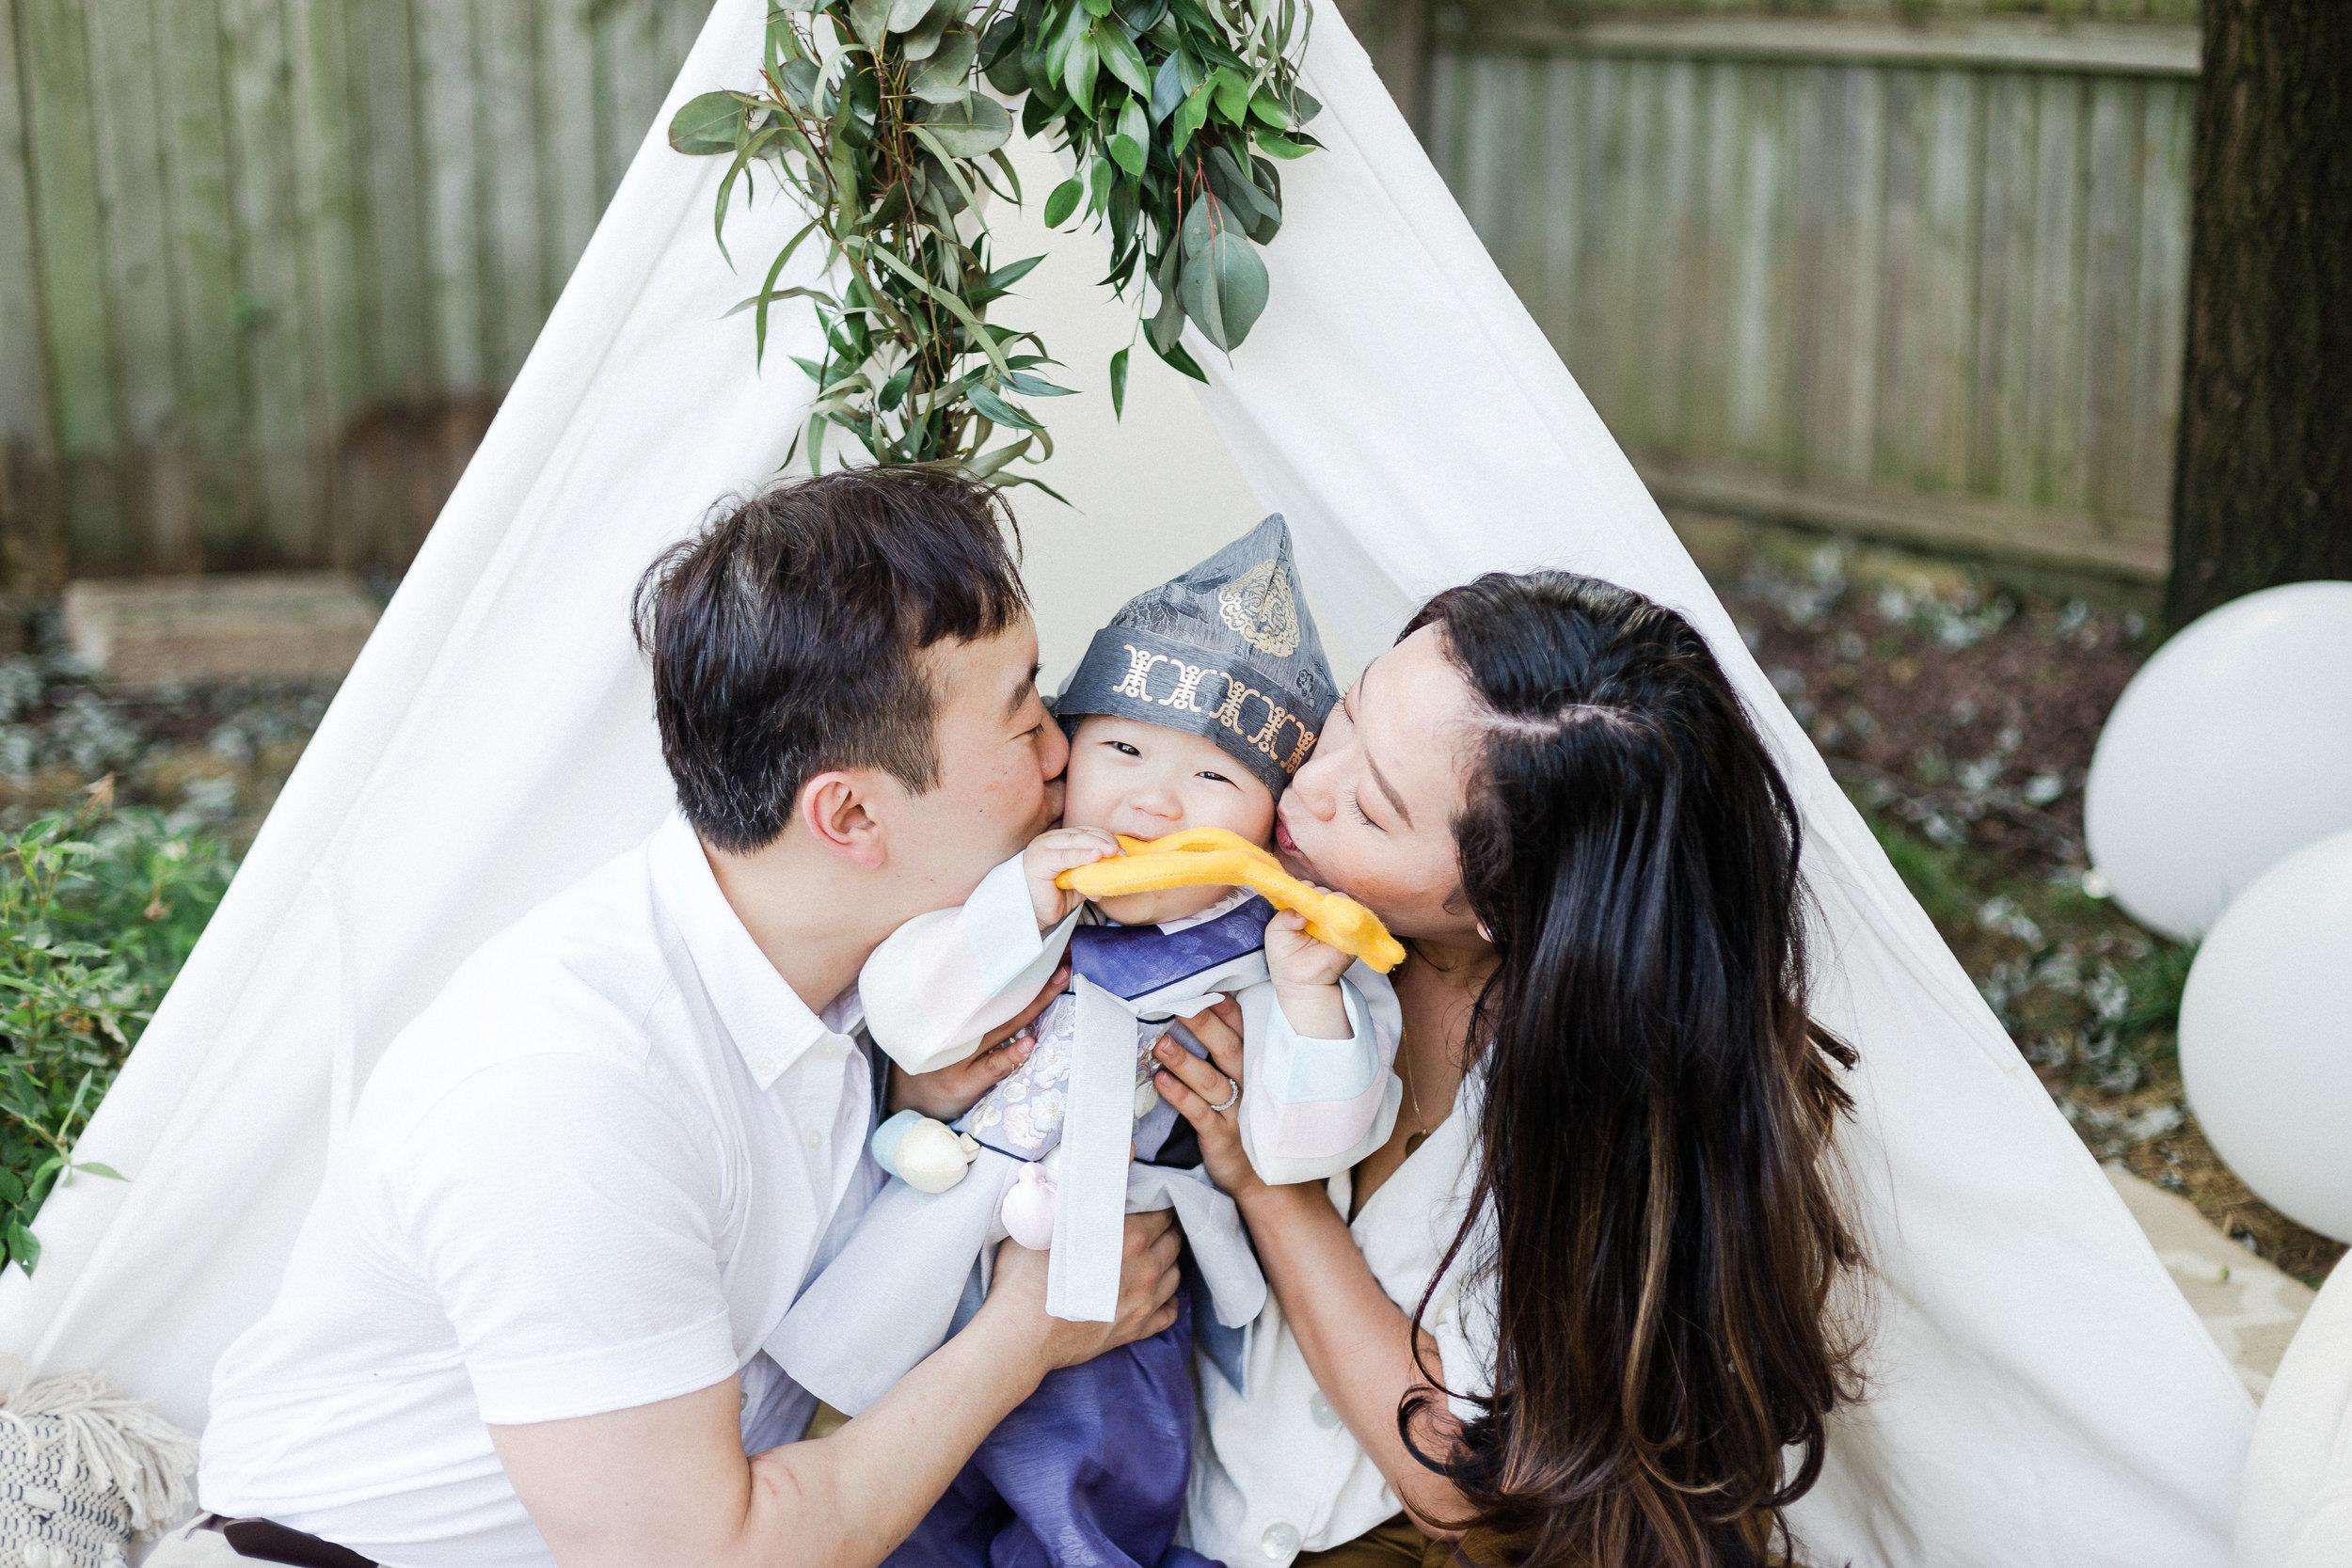 lissie-loomis-photo-nyc-family-photographer-brooklyn-baby22.JPG